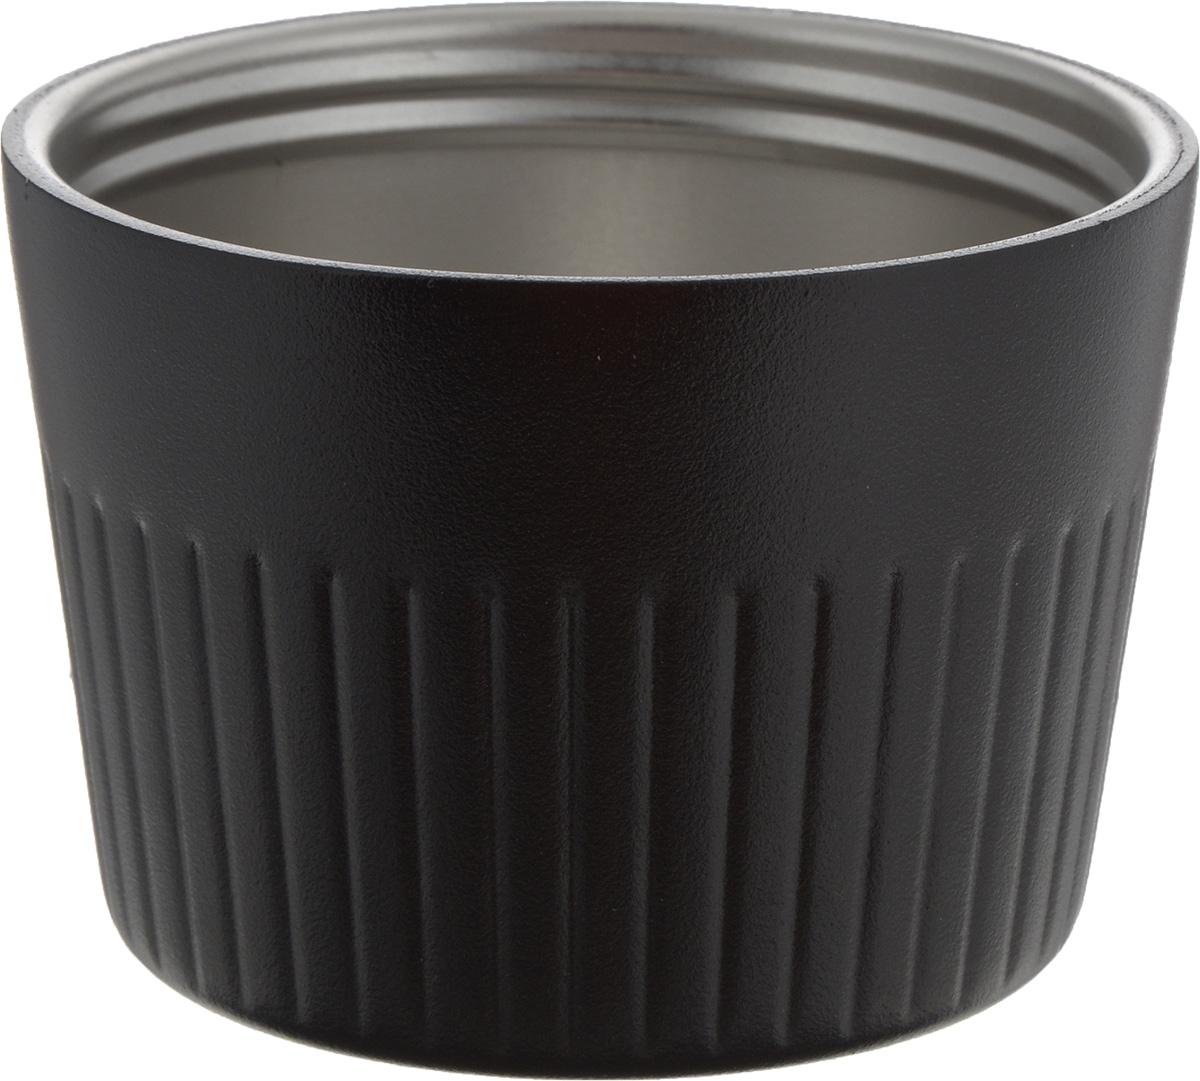 Термокружка Primus Trailbreak Cup, цвет: черный, 250 мл